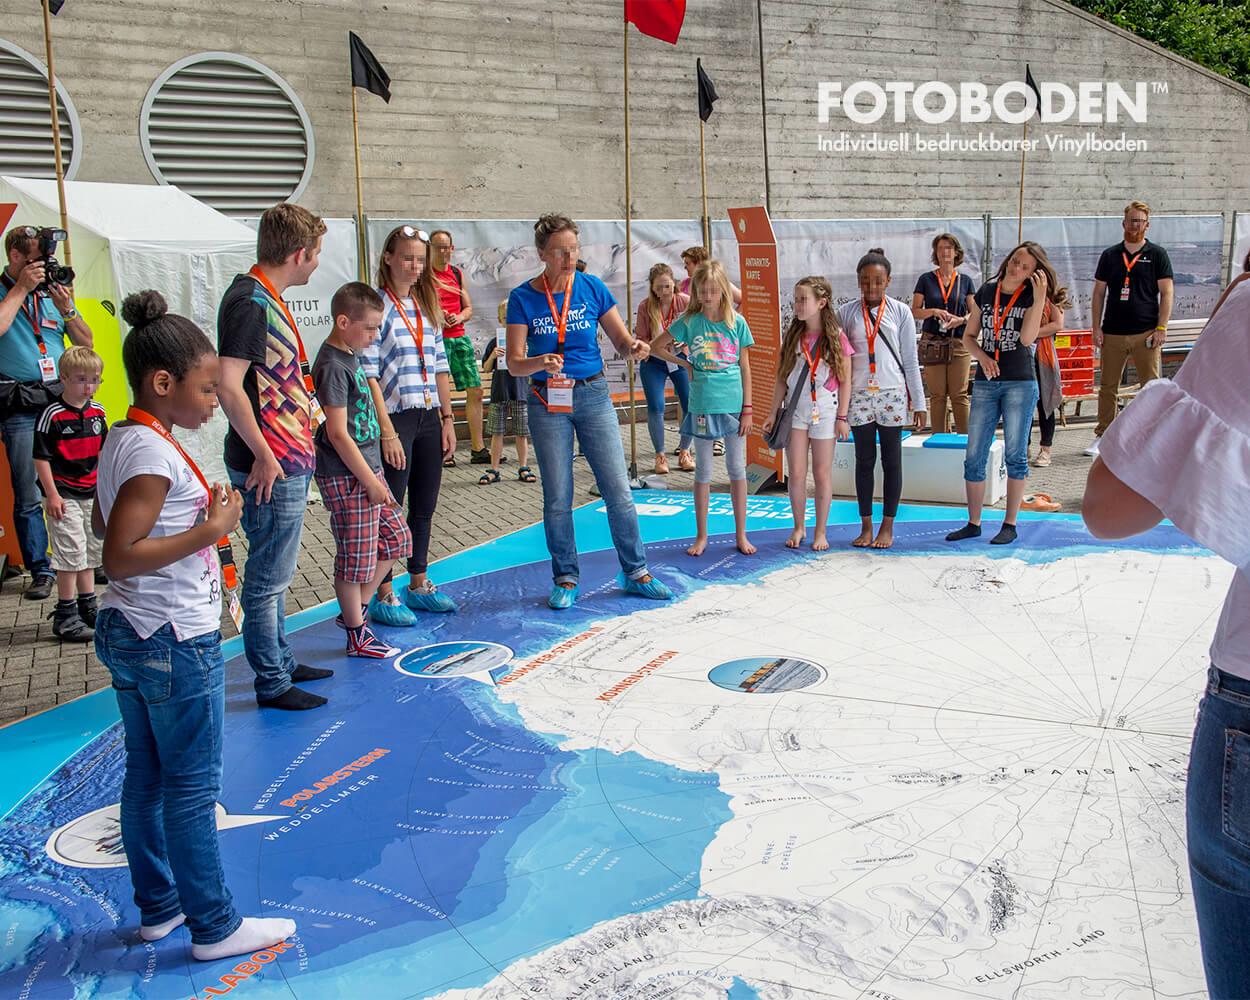 Antarktiskarte IdeenExpo Hannover 1Ausstellung Museum  Raumkonzept Stimmung Museumsboden Ausstellungsboden Fotoboden Vinylboden Flooring Individuell Event